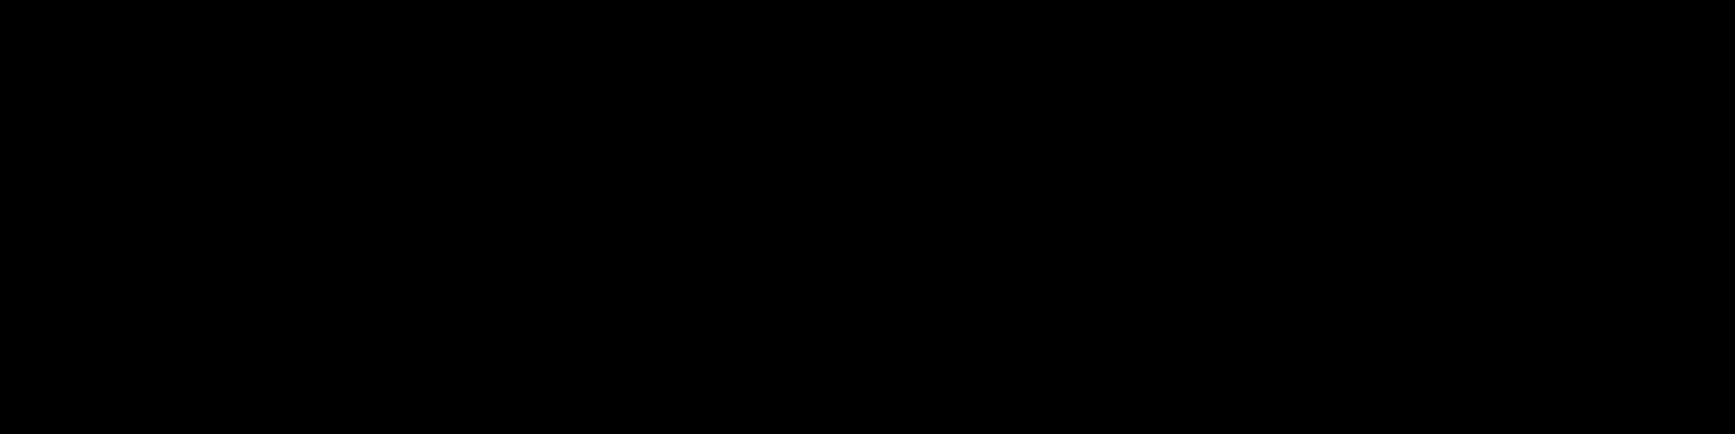 Flower-Banner-Horizontal.png